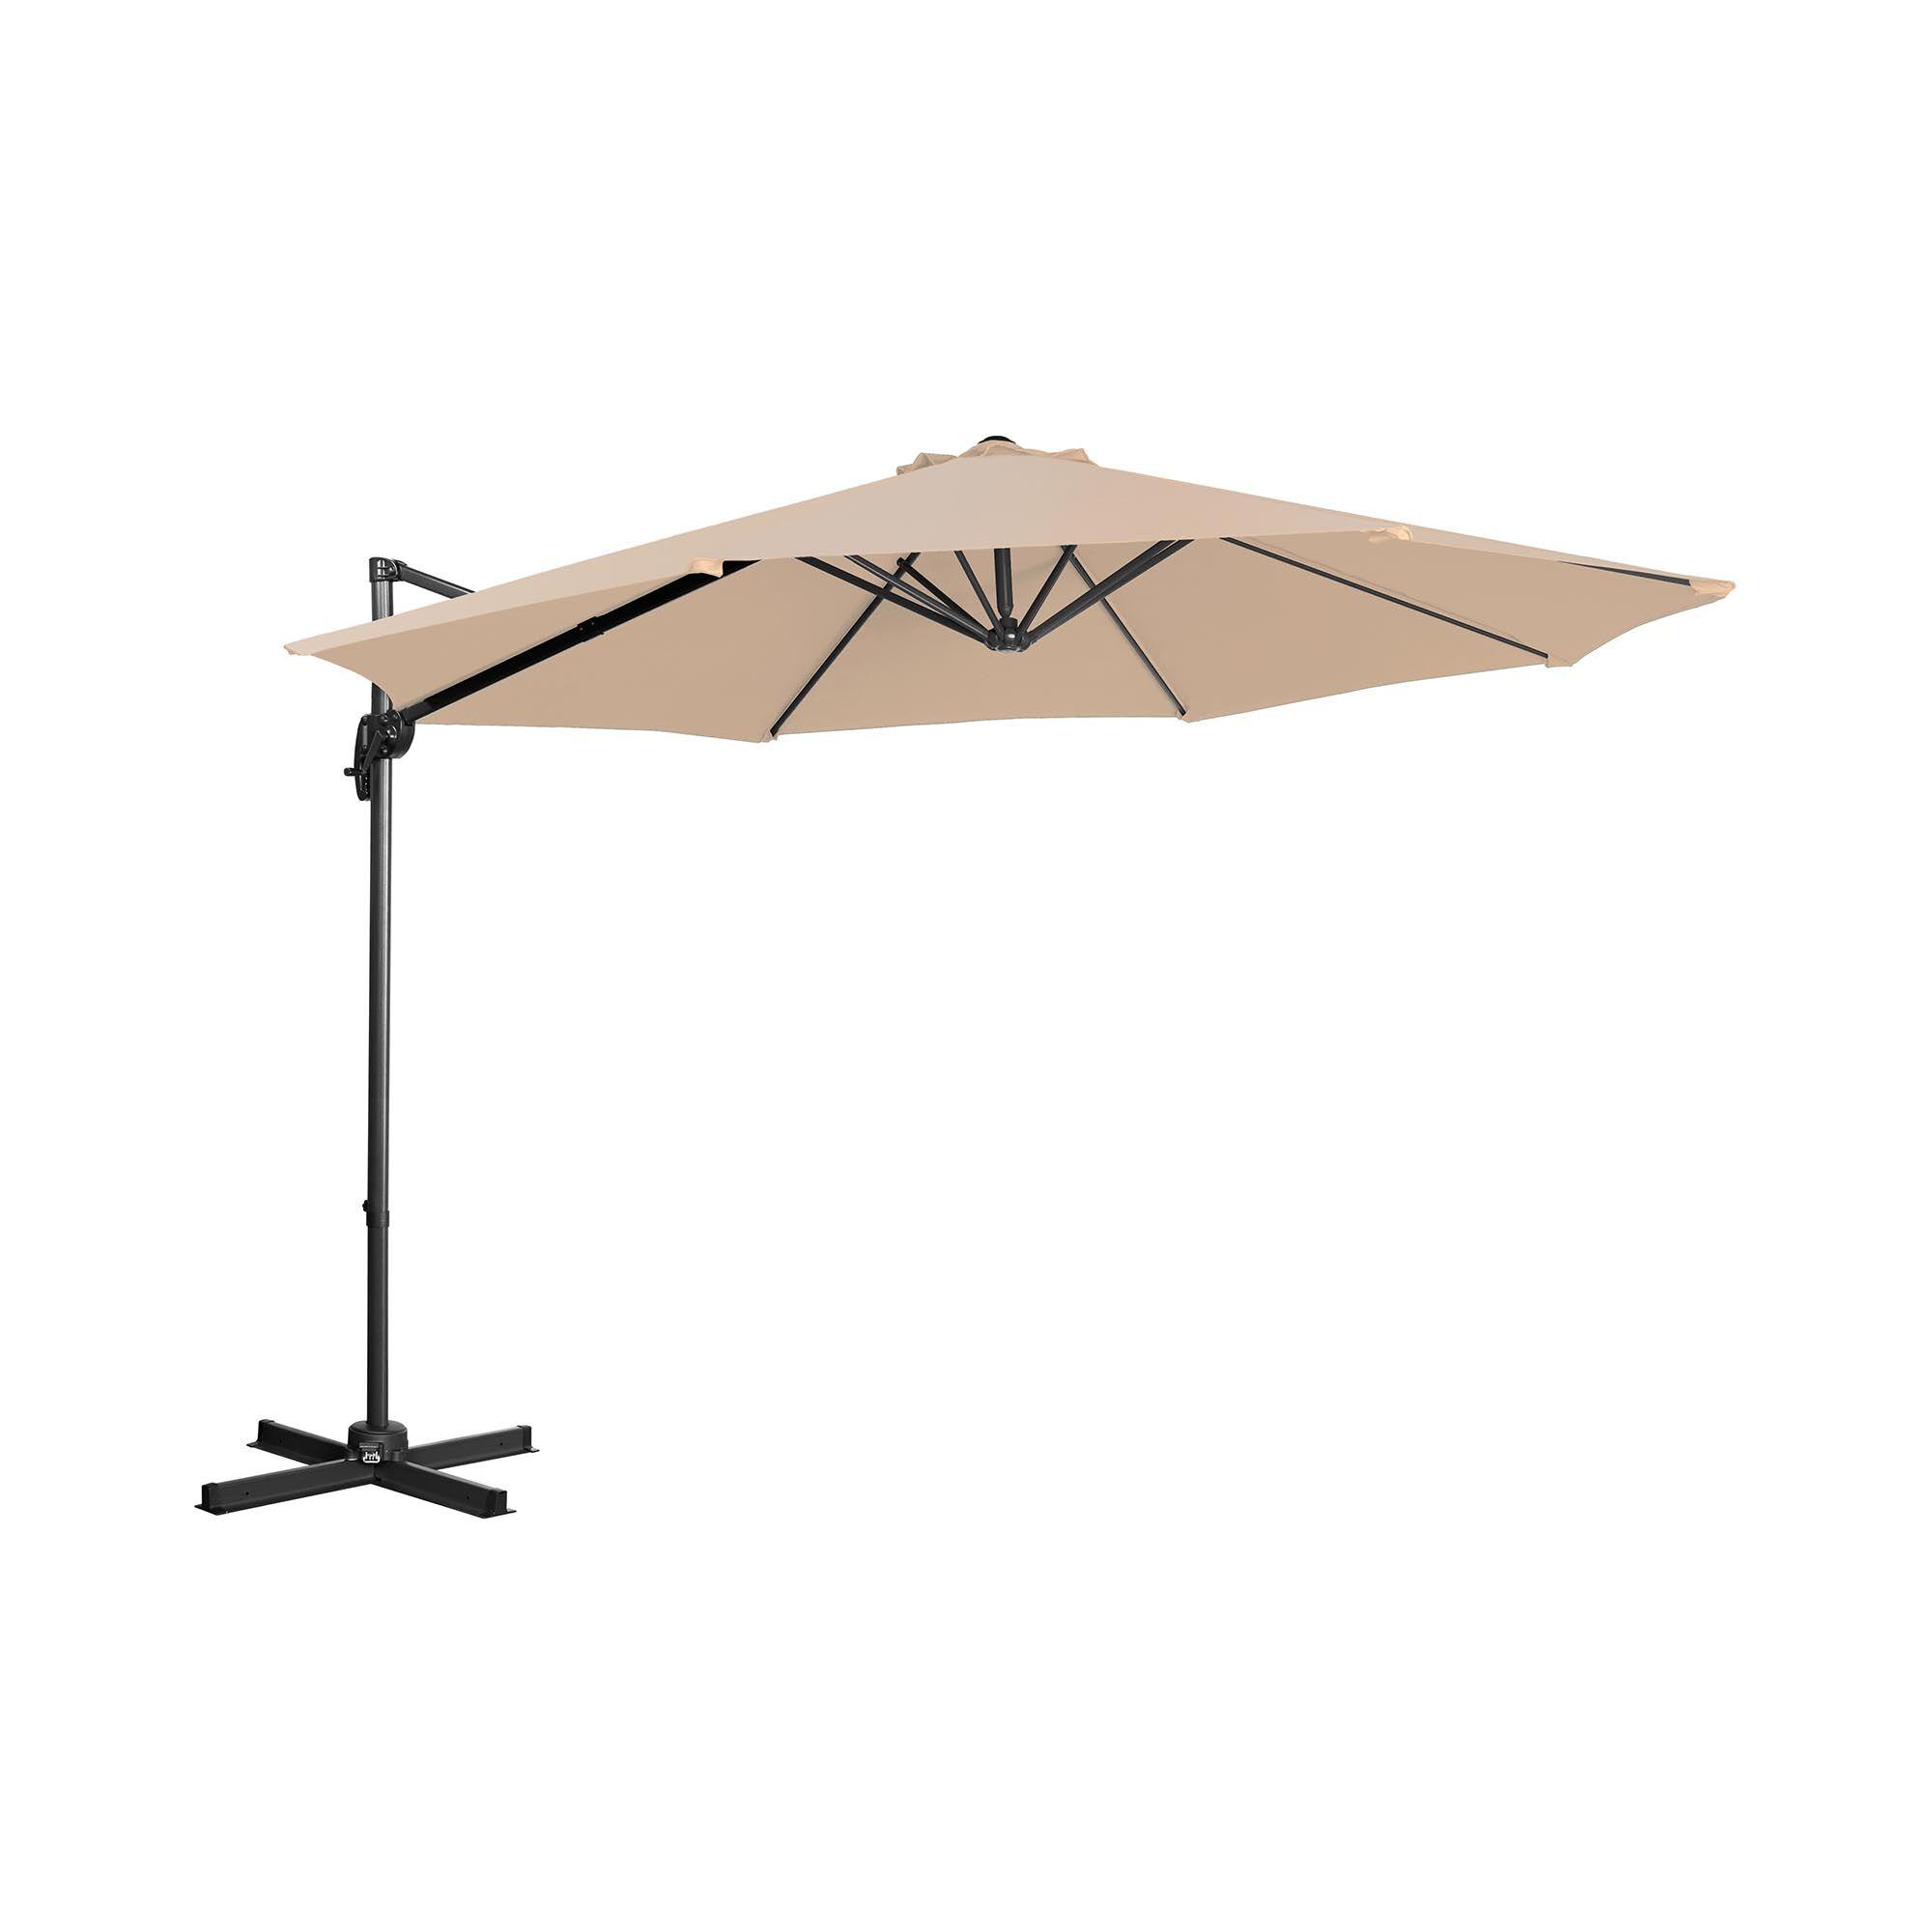 Uniprodo Hanging Parasol - creme - round - Ã 300 cm - rotatable